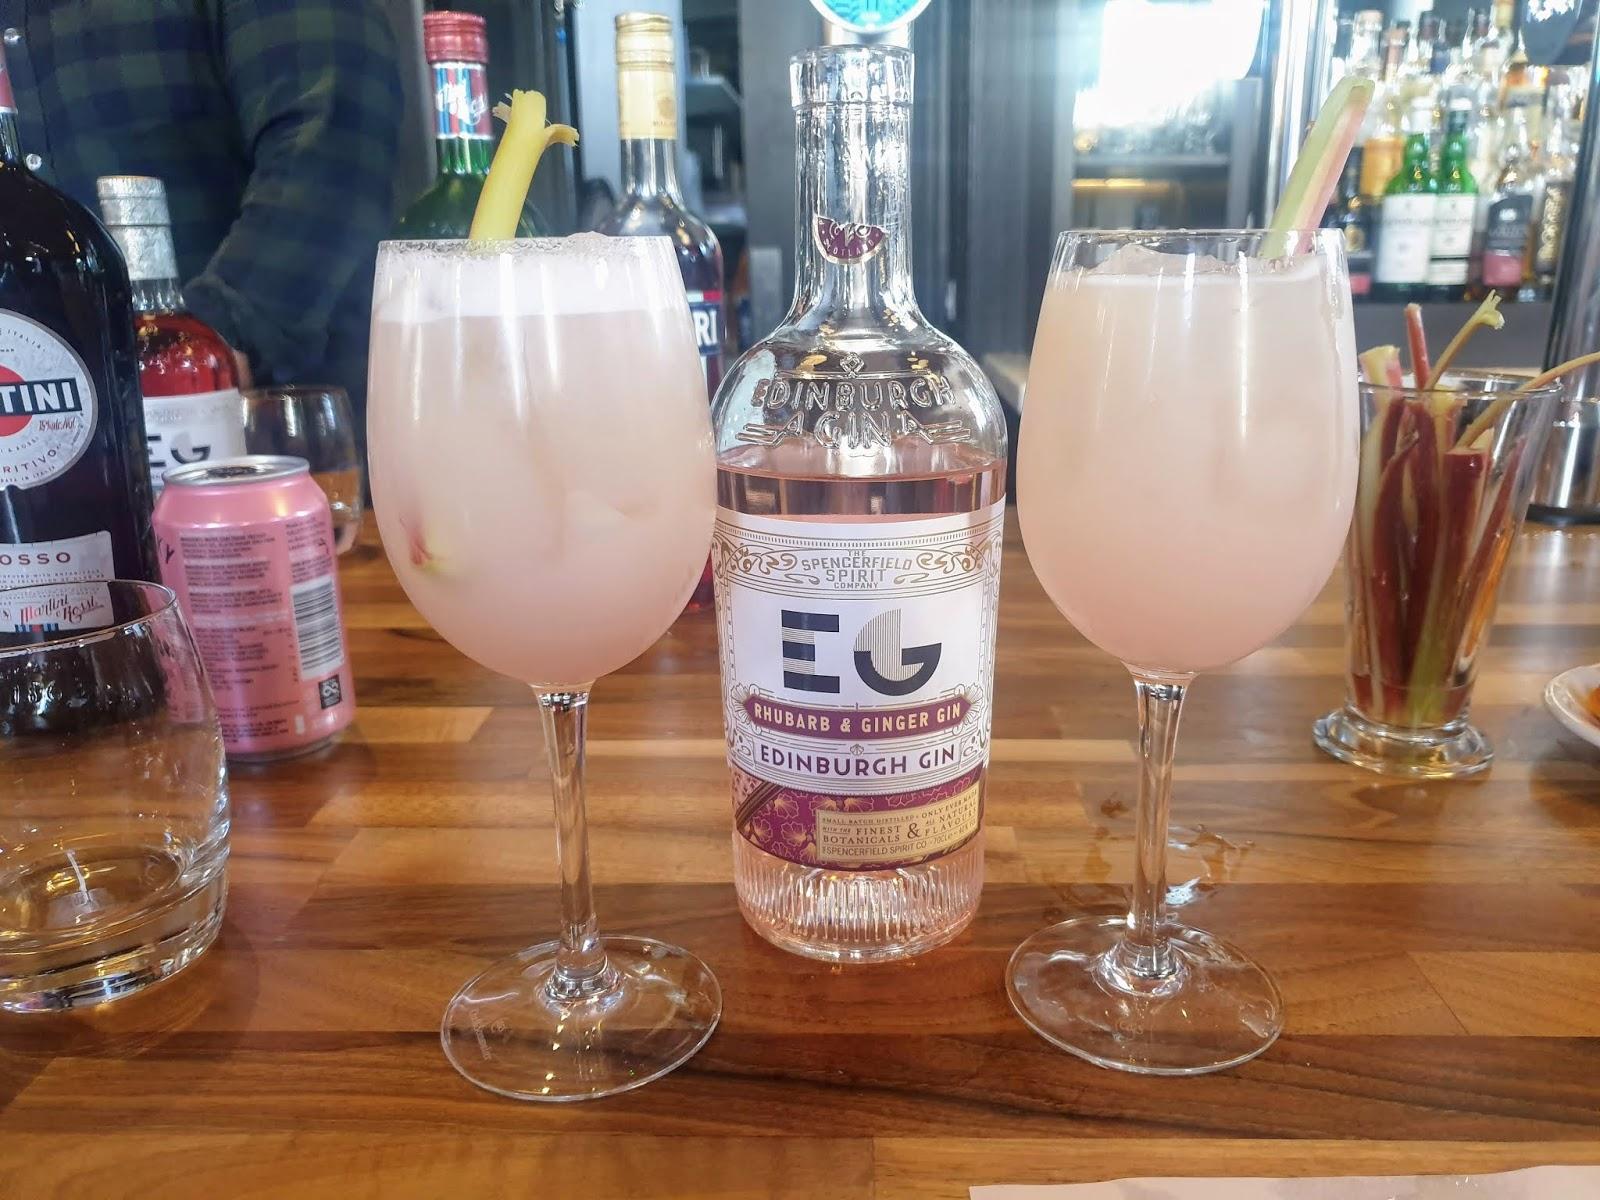 EDINBURGH PINK GIN RHUBARB AND ELEDERFLOWER